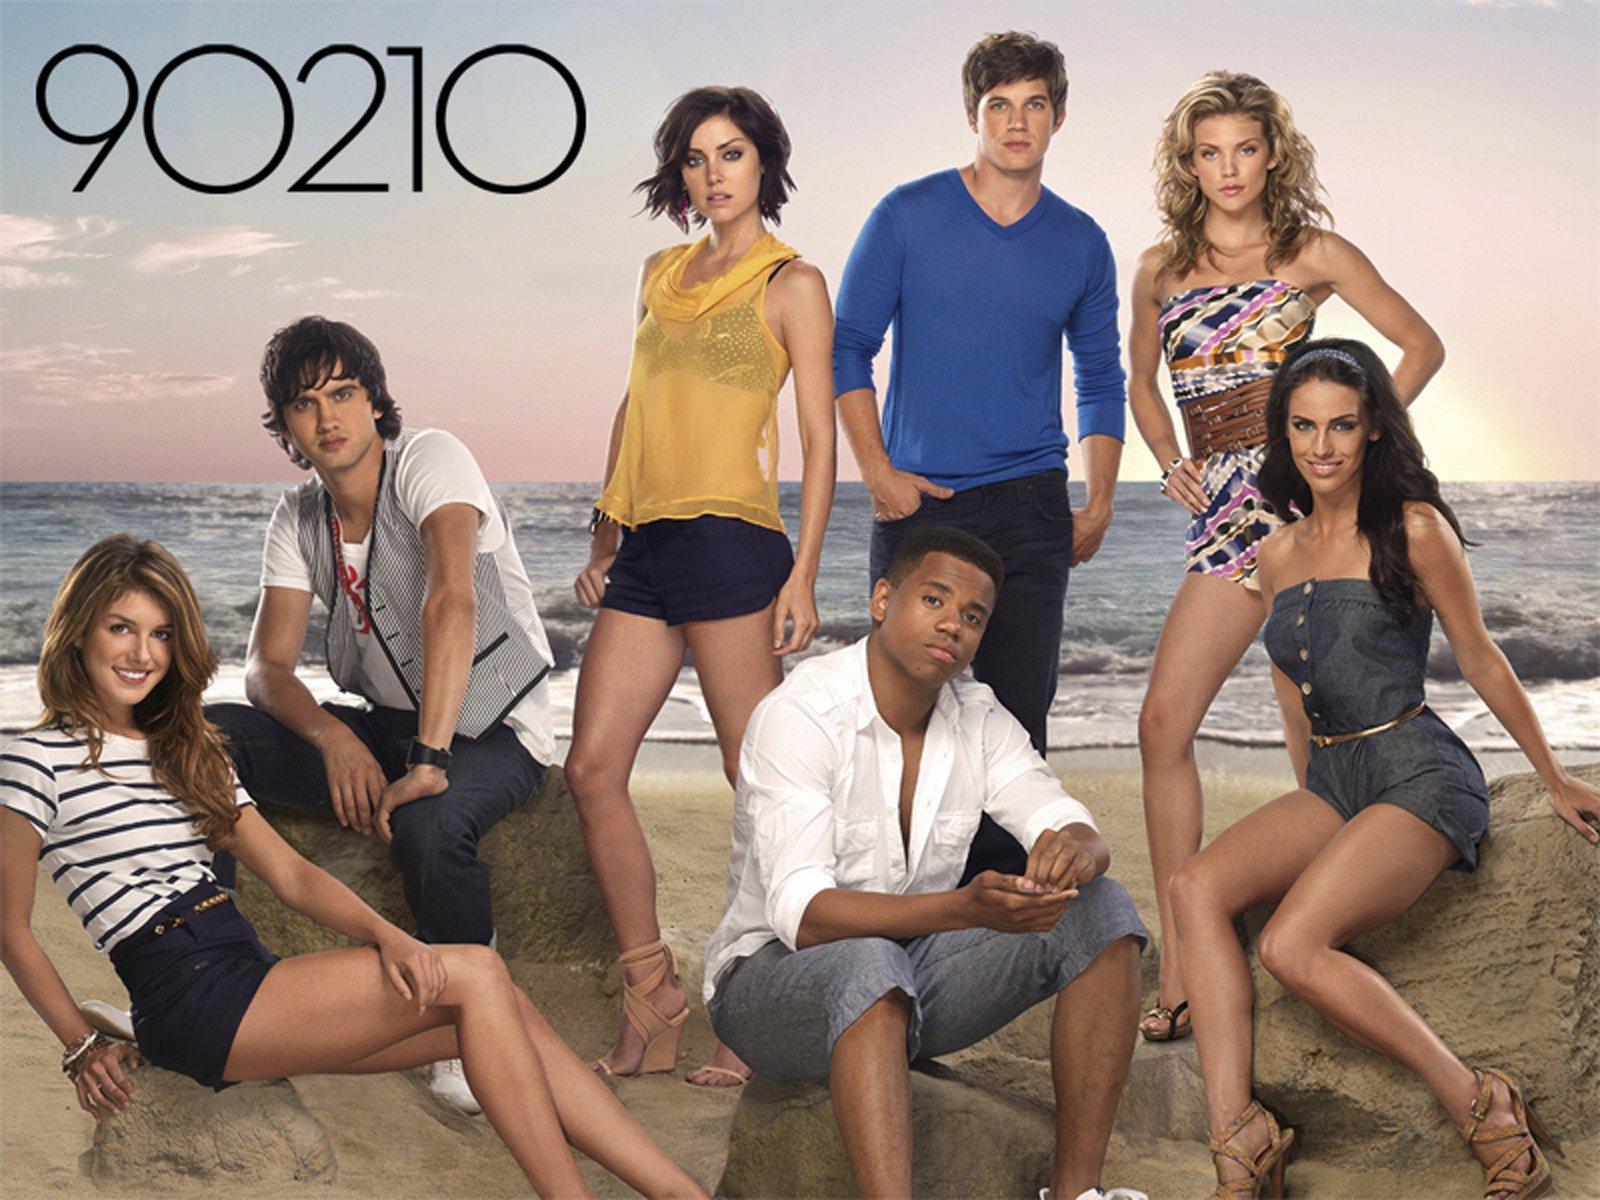 keeping up with the kardashians season 9 episode 18 arawatch